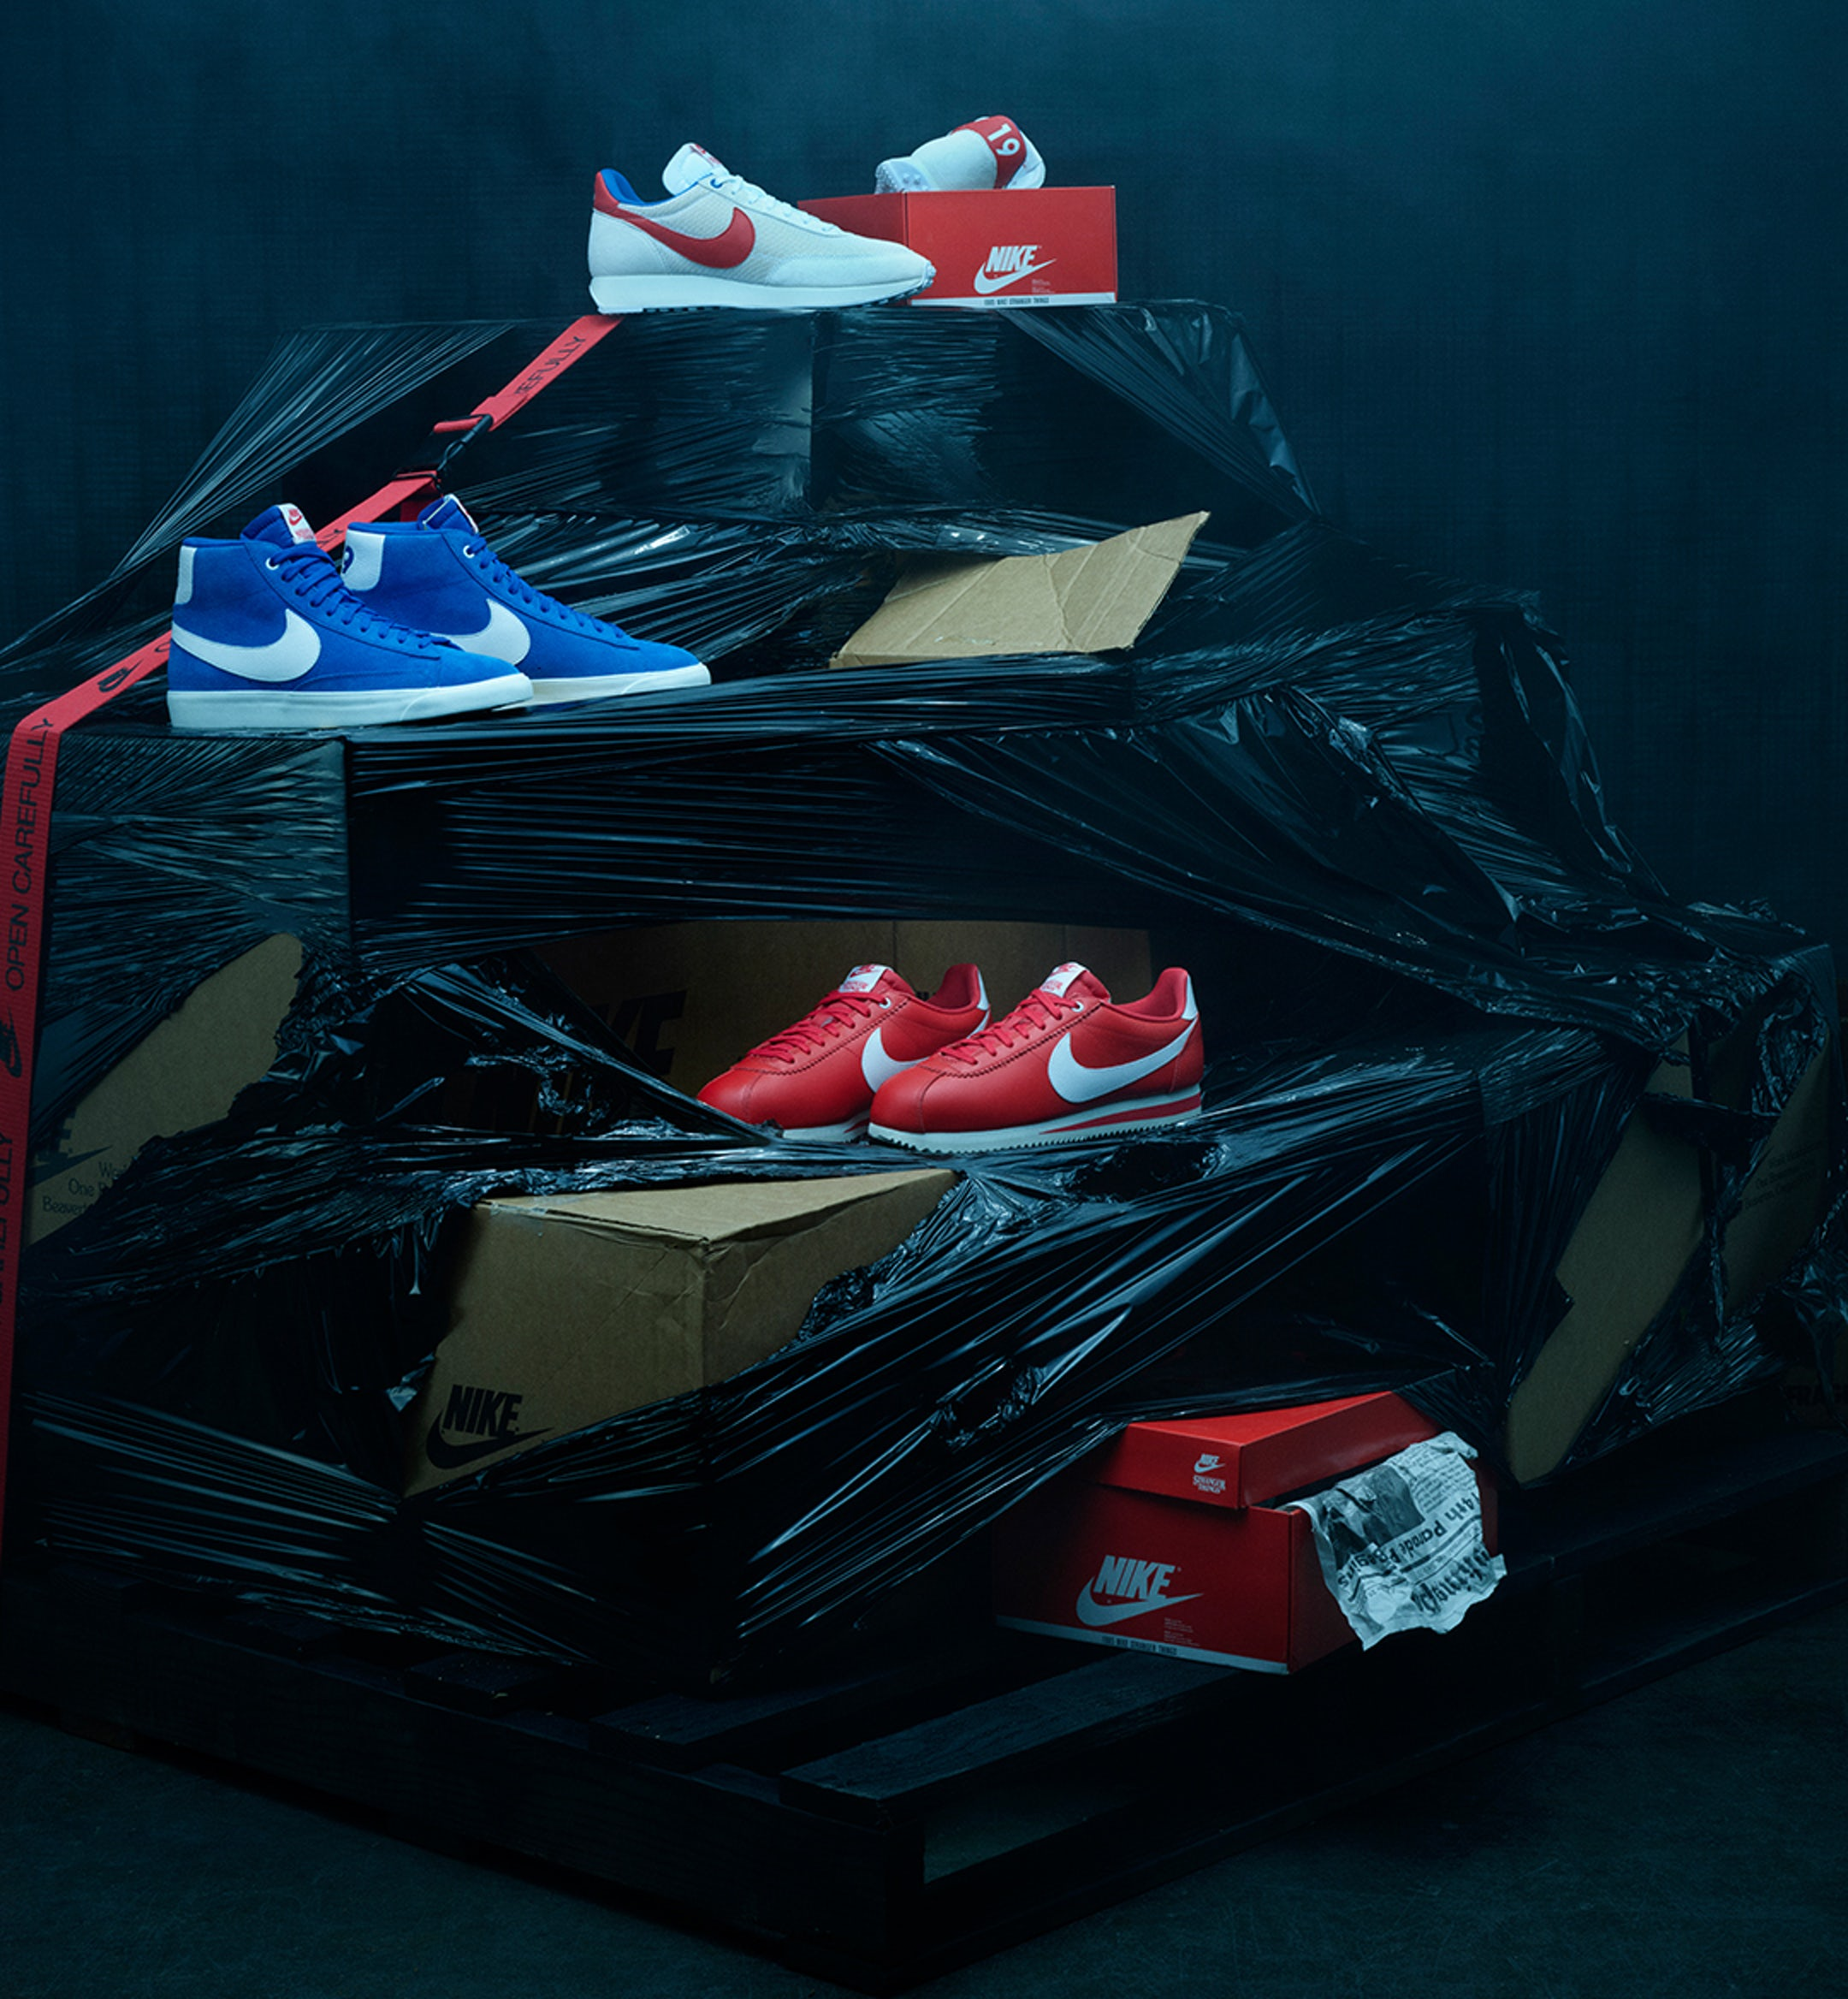 nike stranger things sneakers mobile